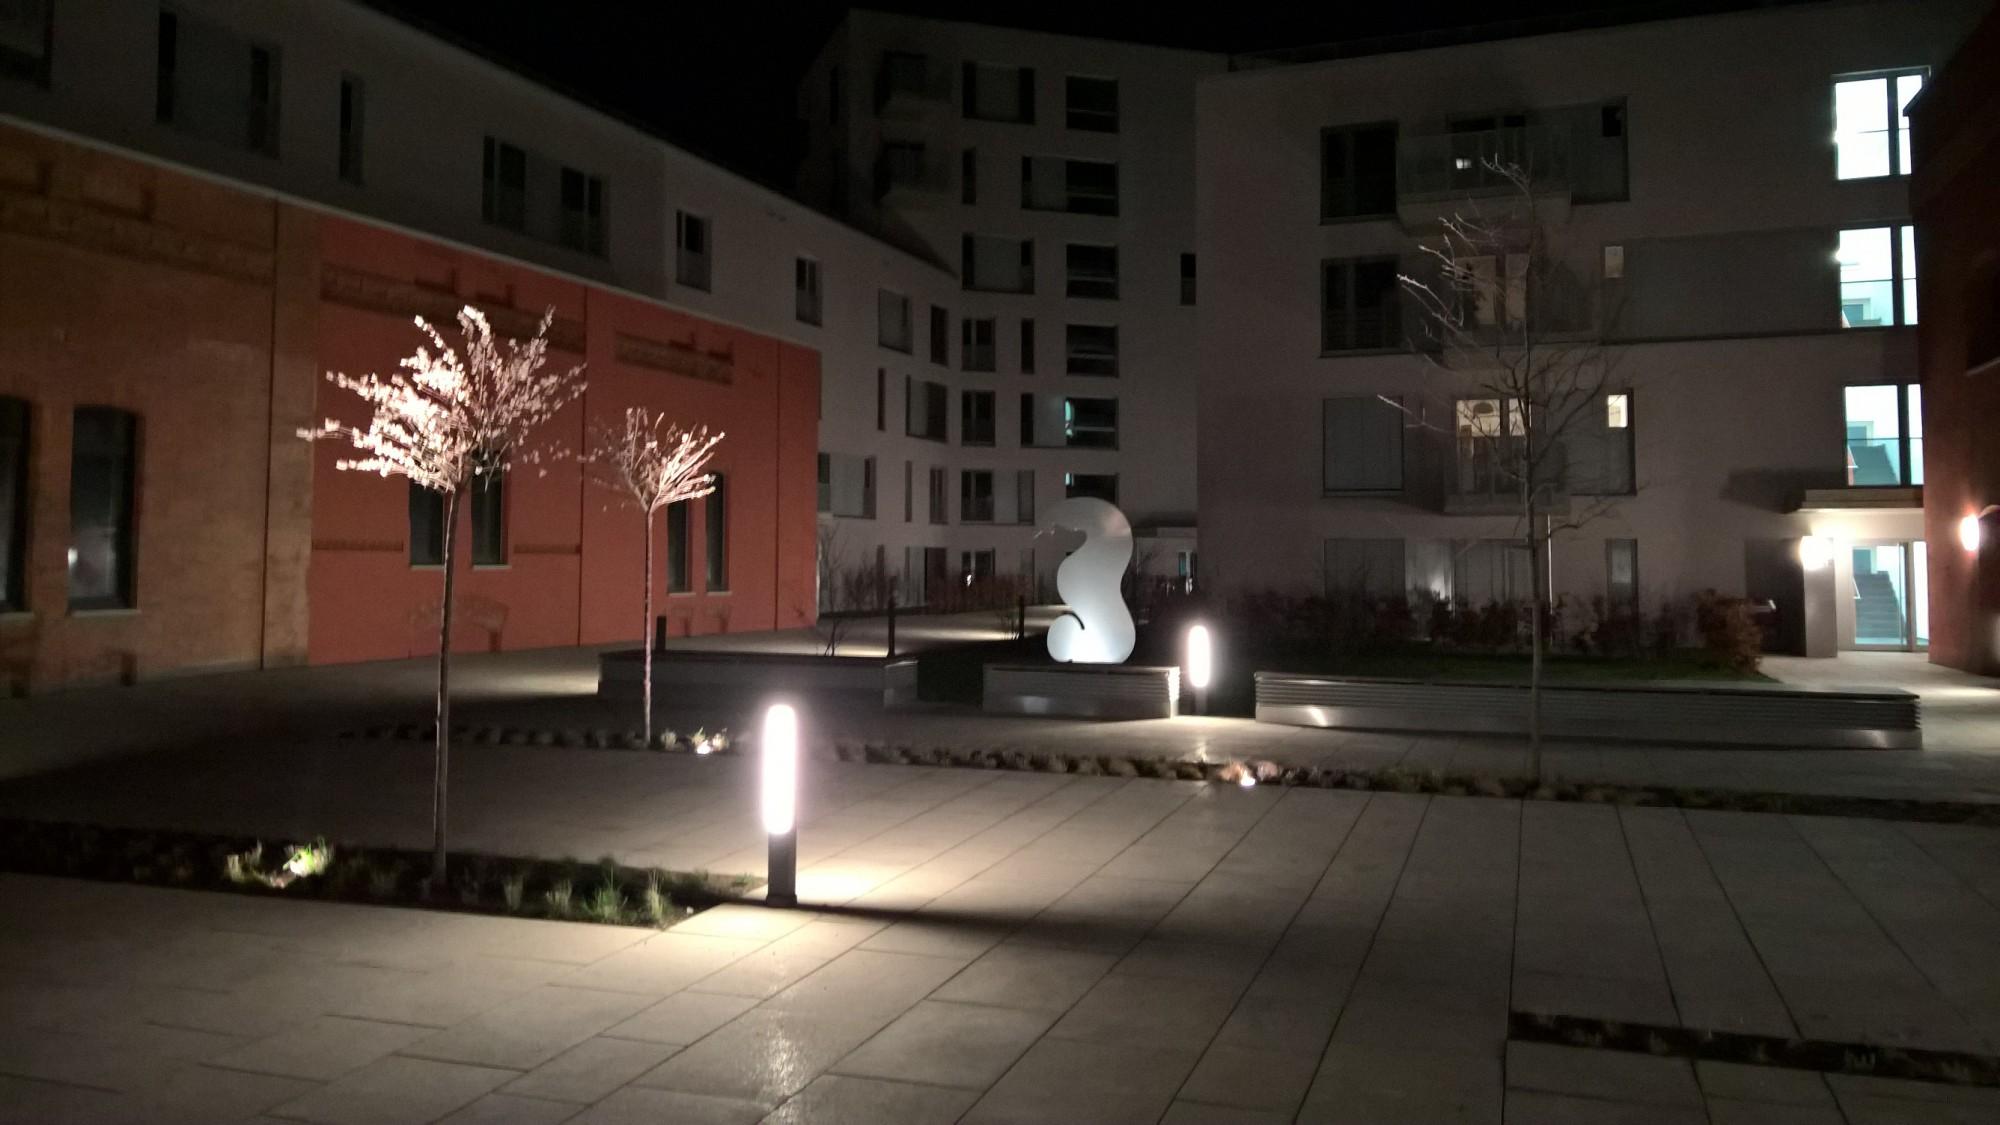 SAPRI-Skulptur im REALGRUND-Gebäudekomplex